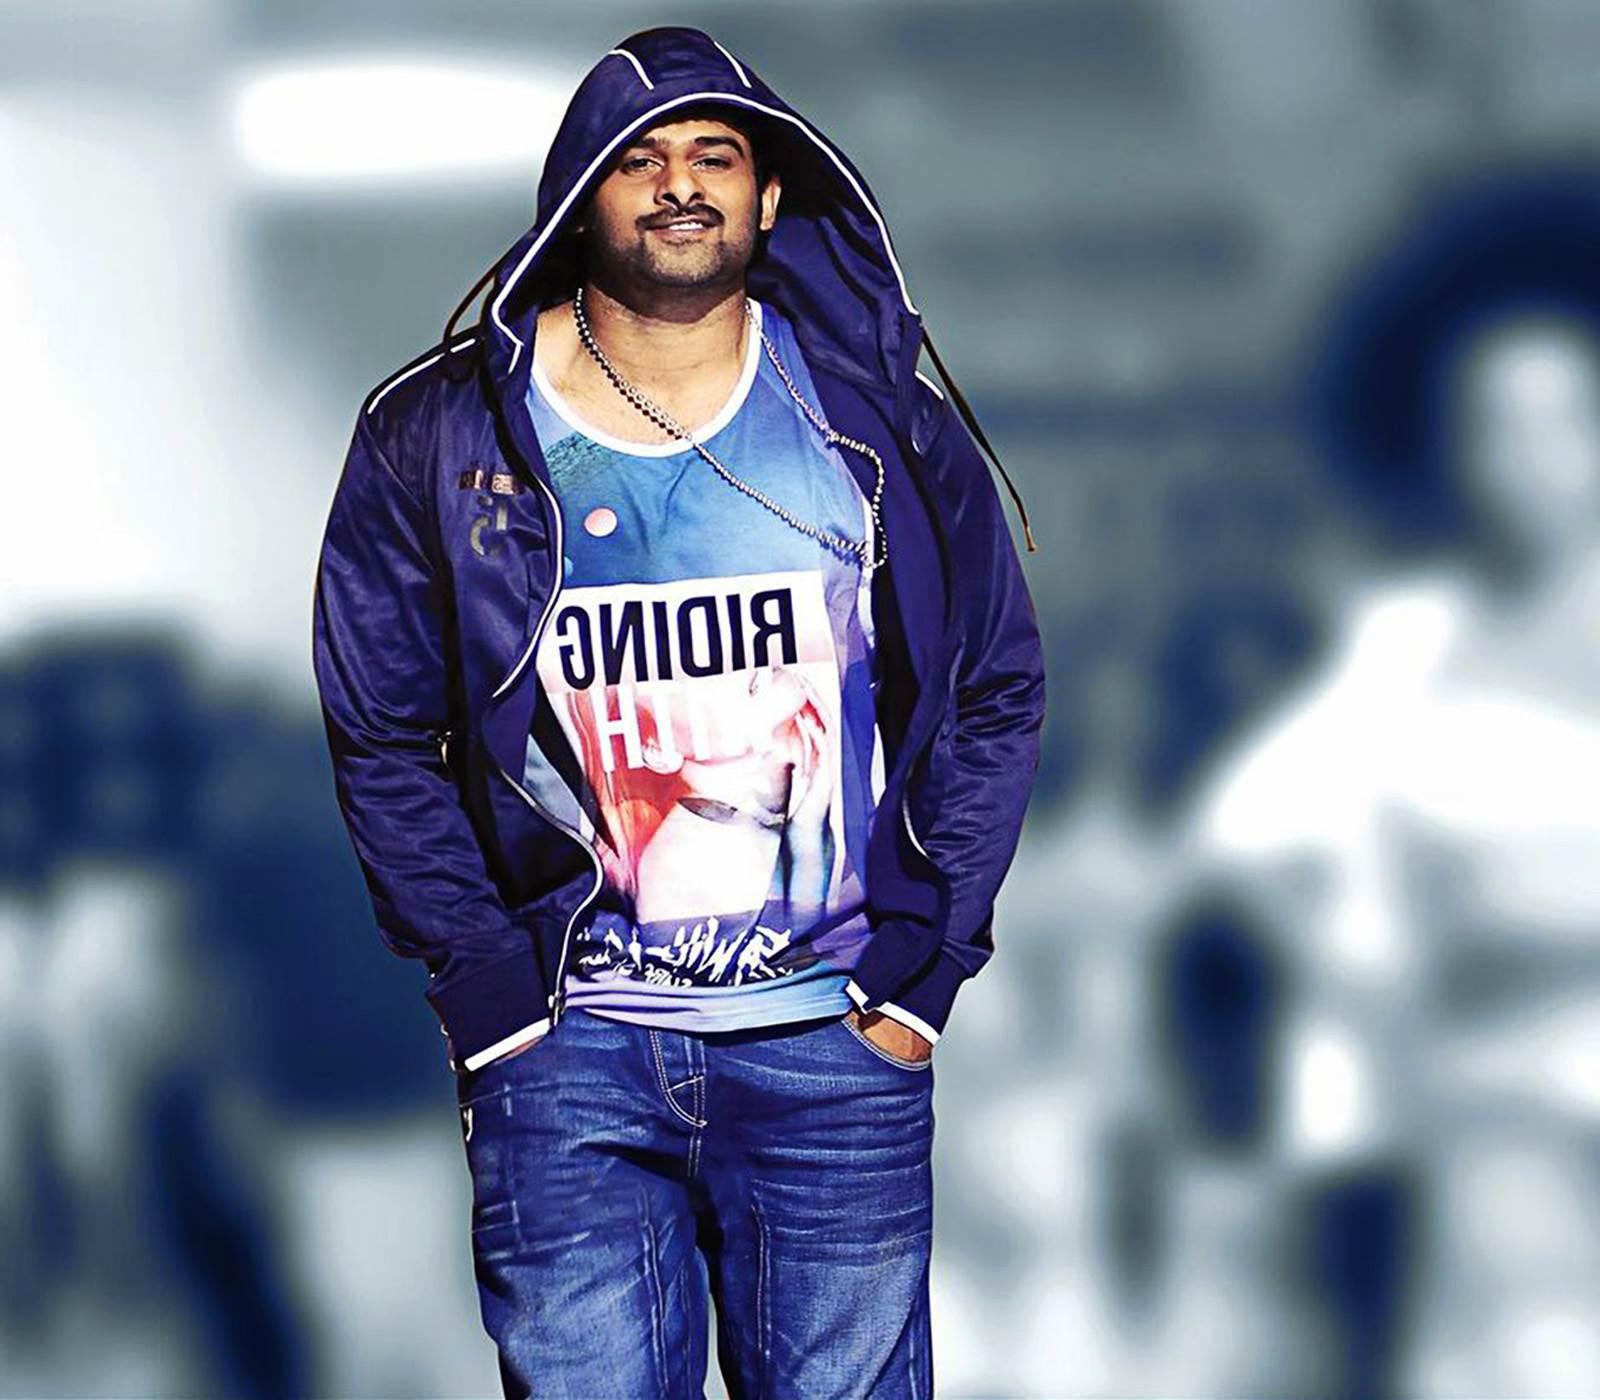 telugu actor allu arjun wallpapersfree download hd wallpapers 1600x1400